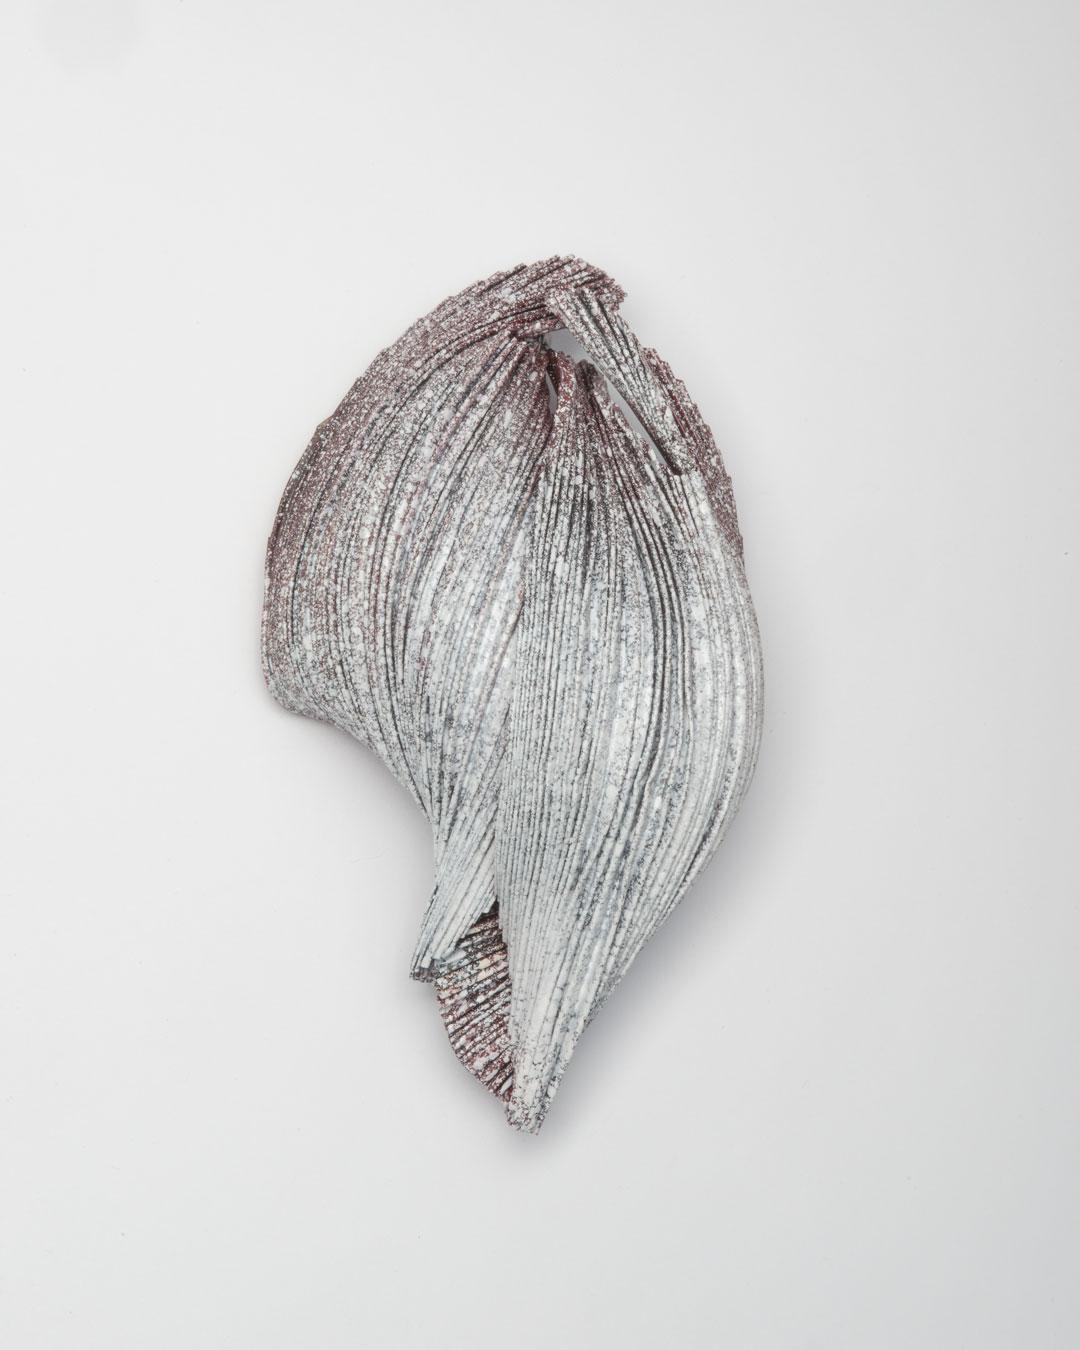 Li Liang, Nr. 1: Line, 2018, brooch; copper, 120 x 80 x 50 mm, €1650